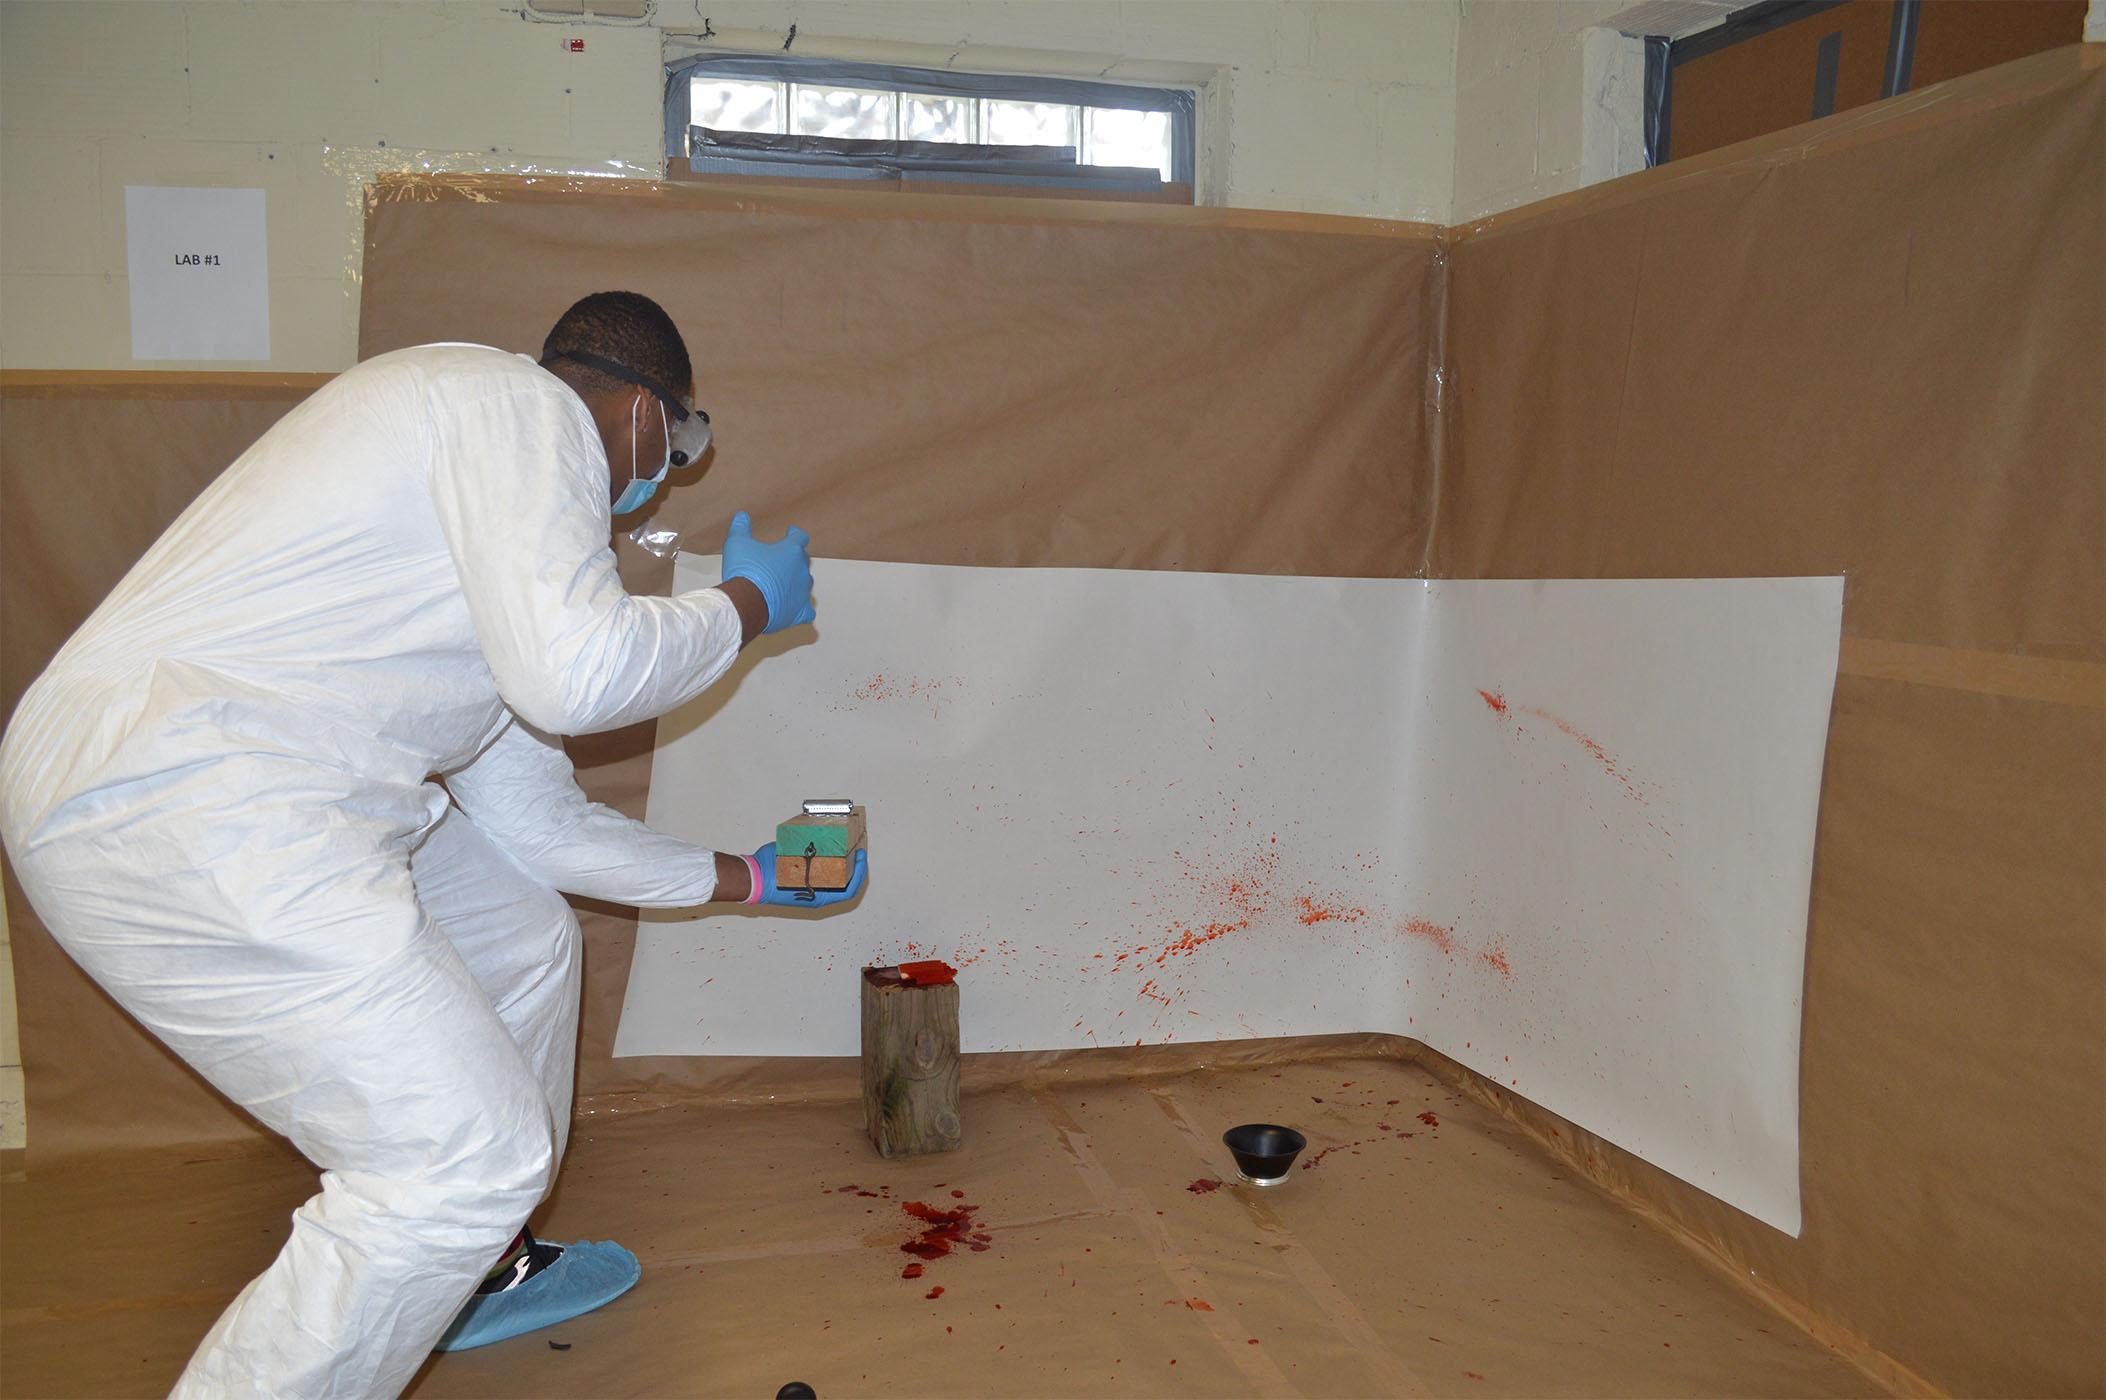 Students recreate crime scenes, mock trial